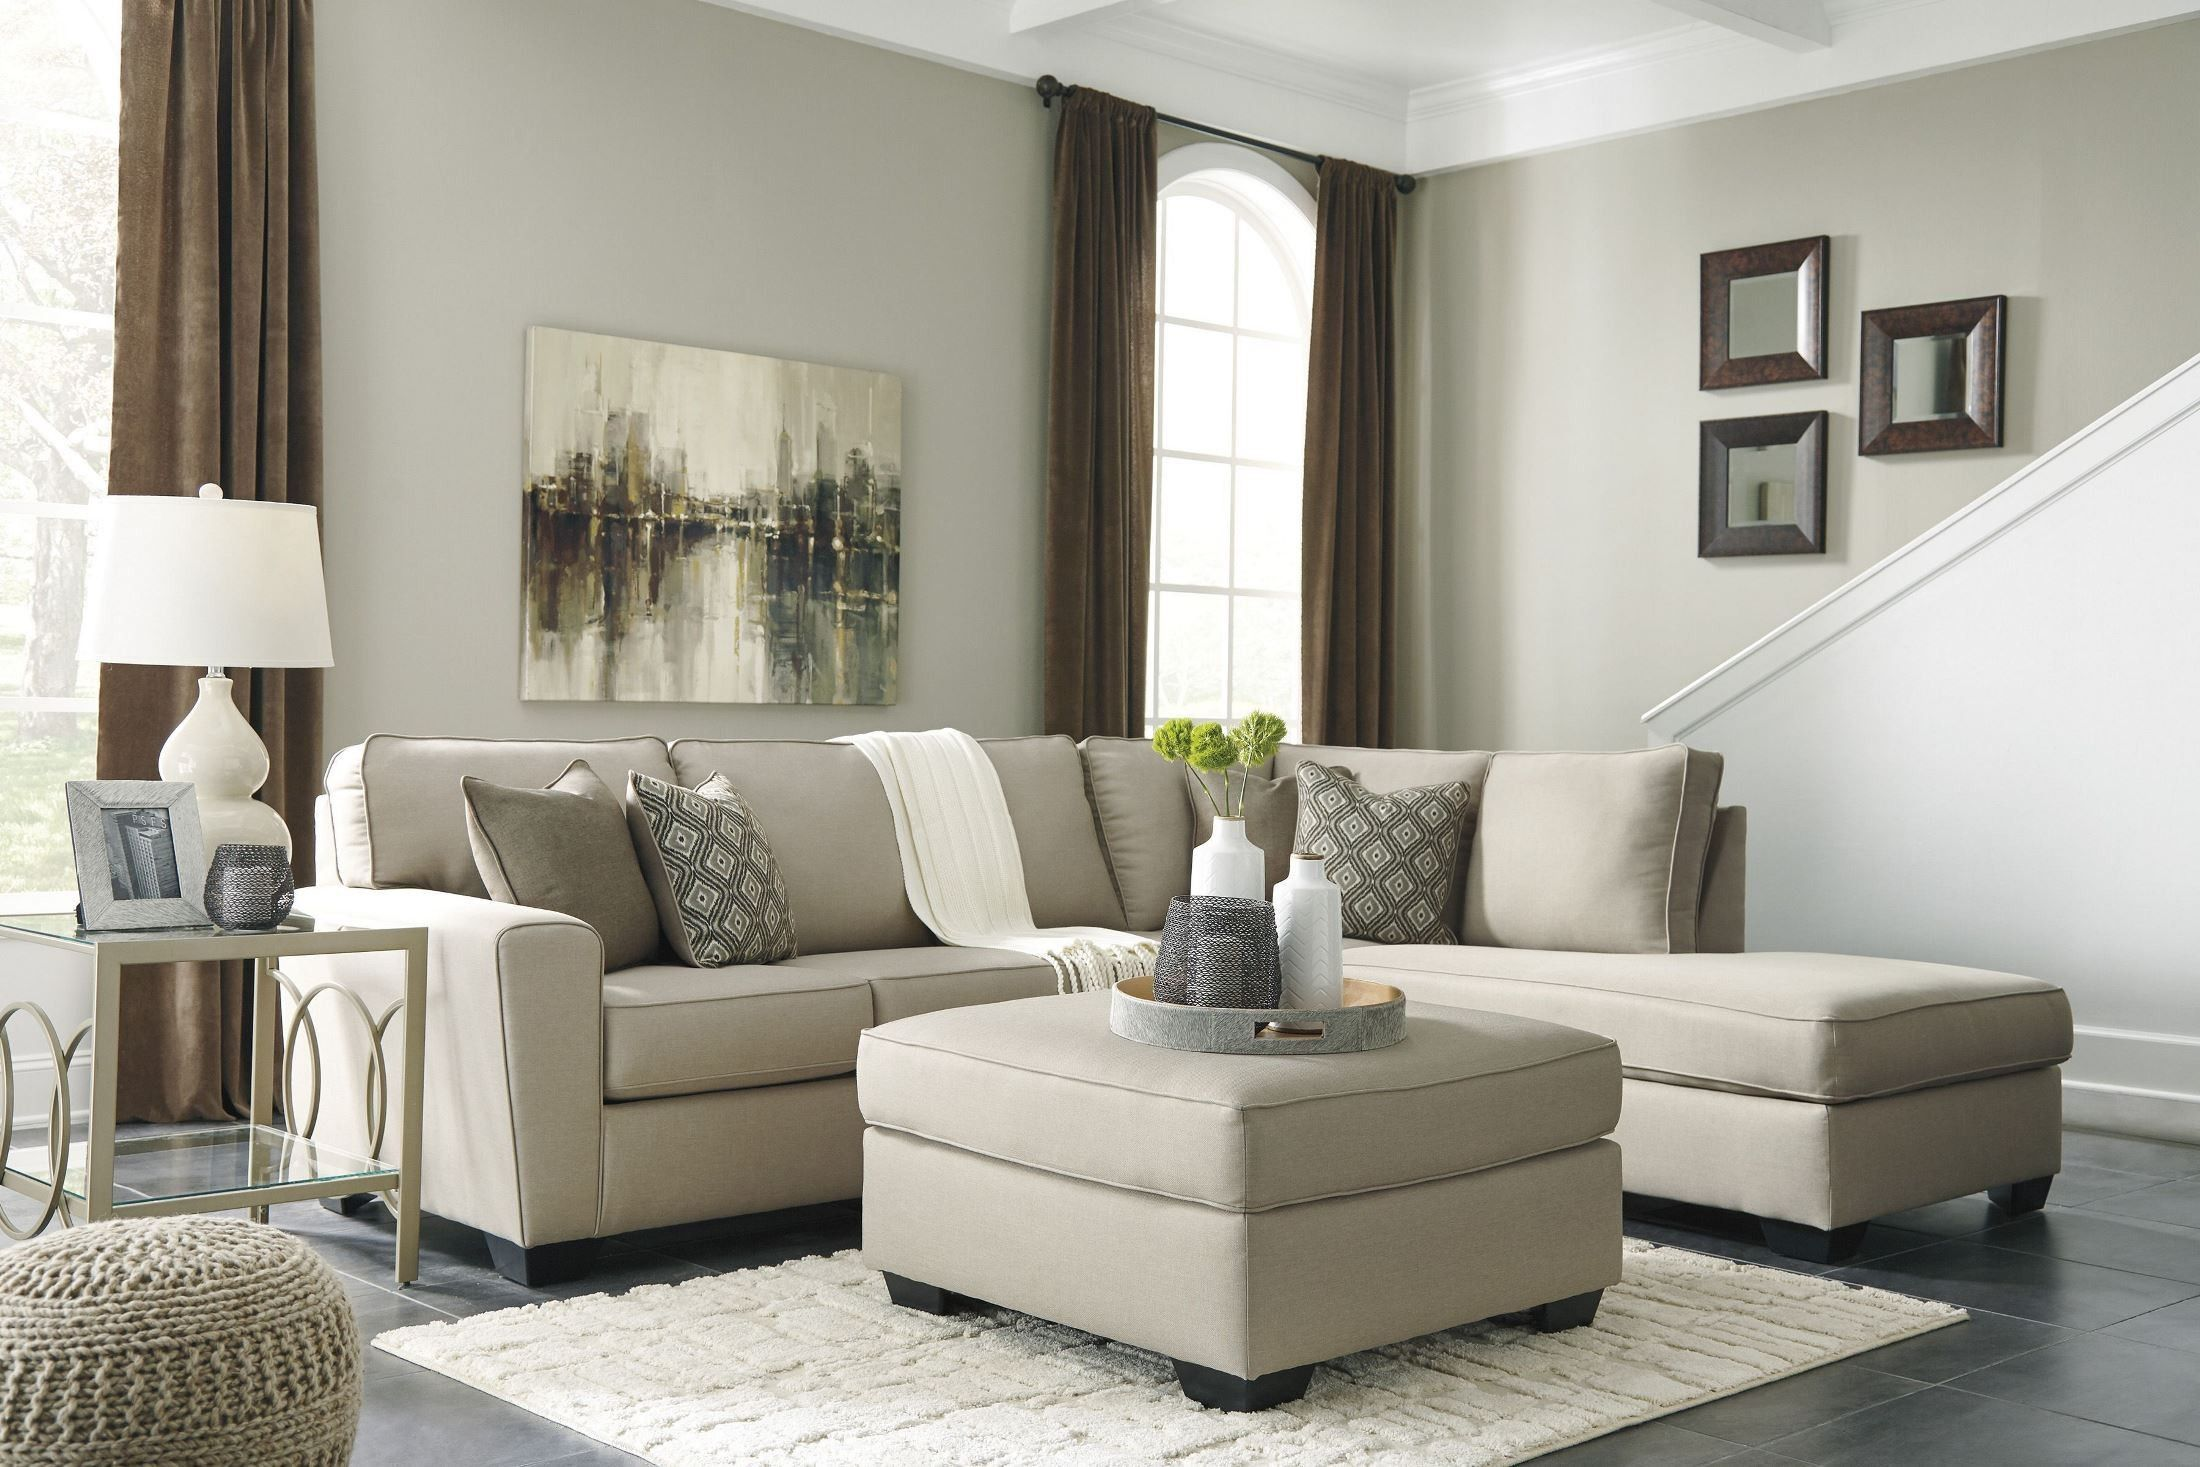 Calicho Ecru Raf Sectional City Furniture Living Room Sofa Furniture #taft #furniture #living #room #sets